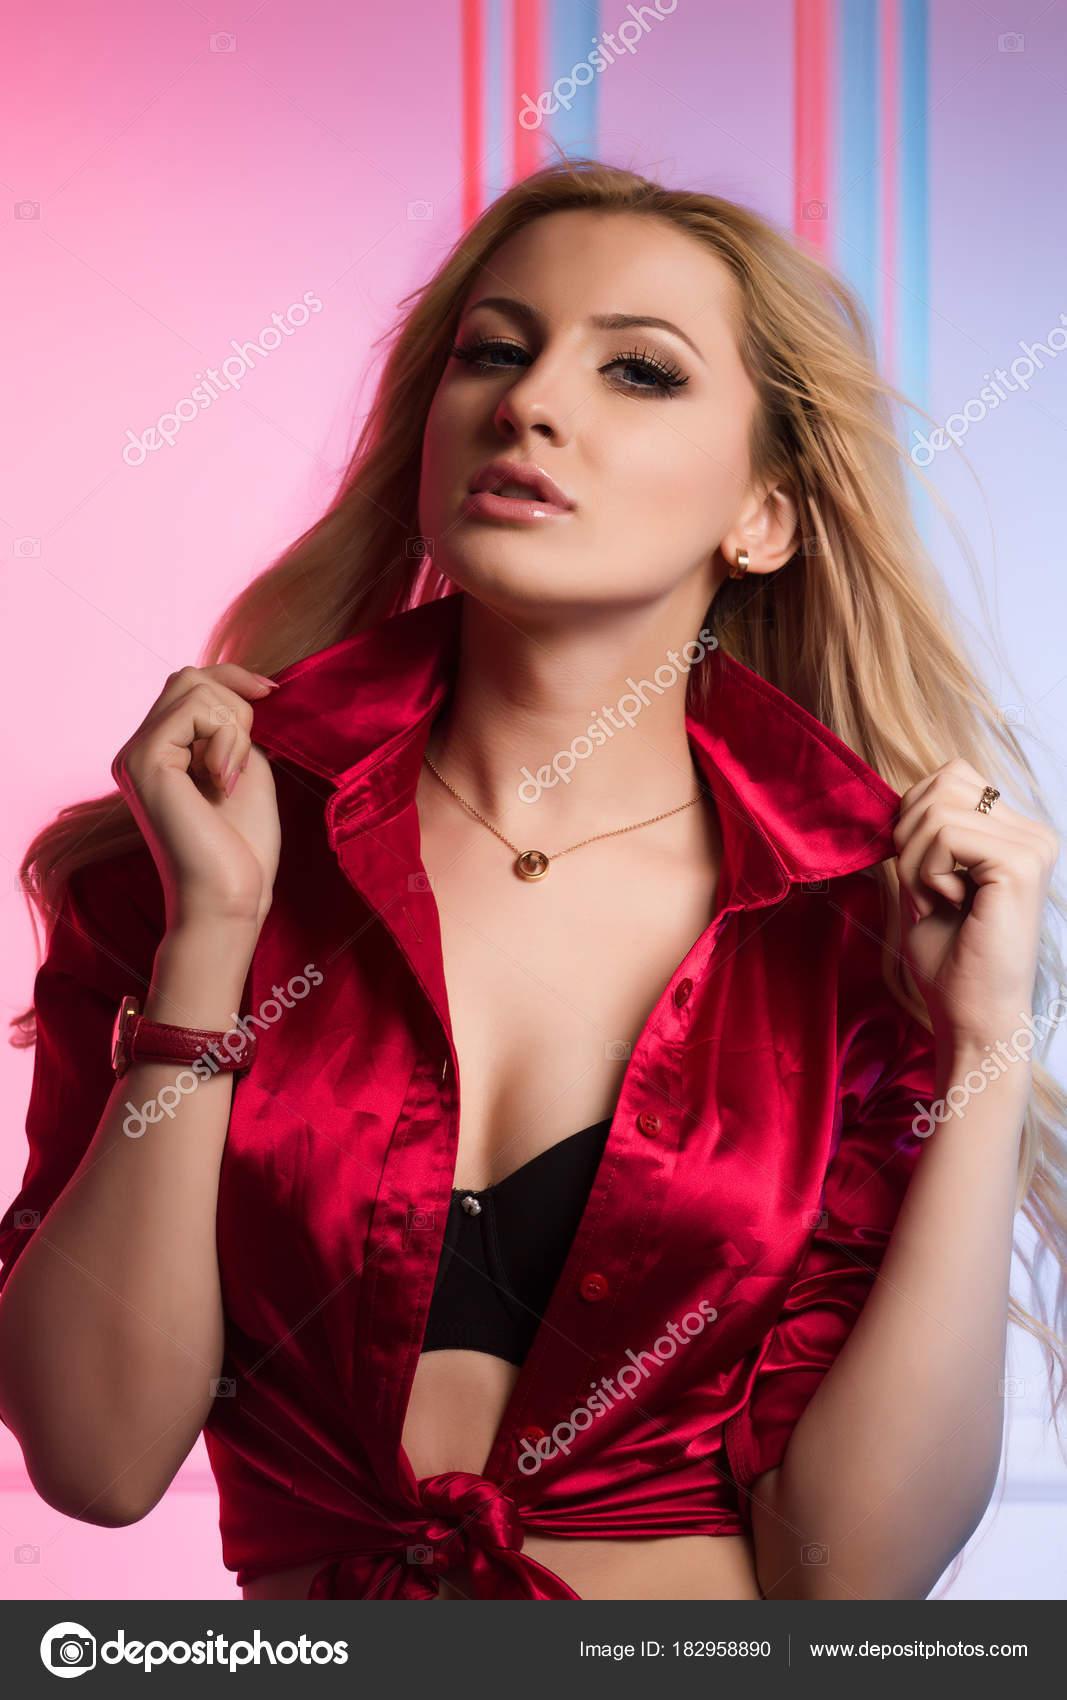 448beba8b16e Γοητευτική νεαρή γυναίκα με σπαστά μαλλιά που φοράει μετάξι κόκκινη μπλούζα